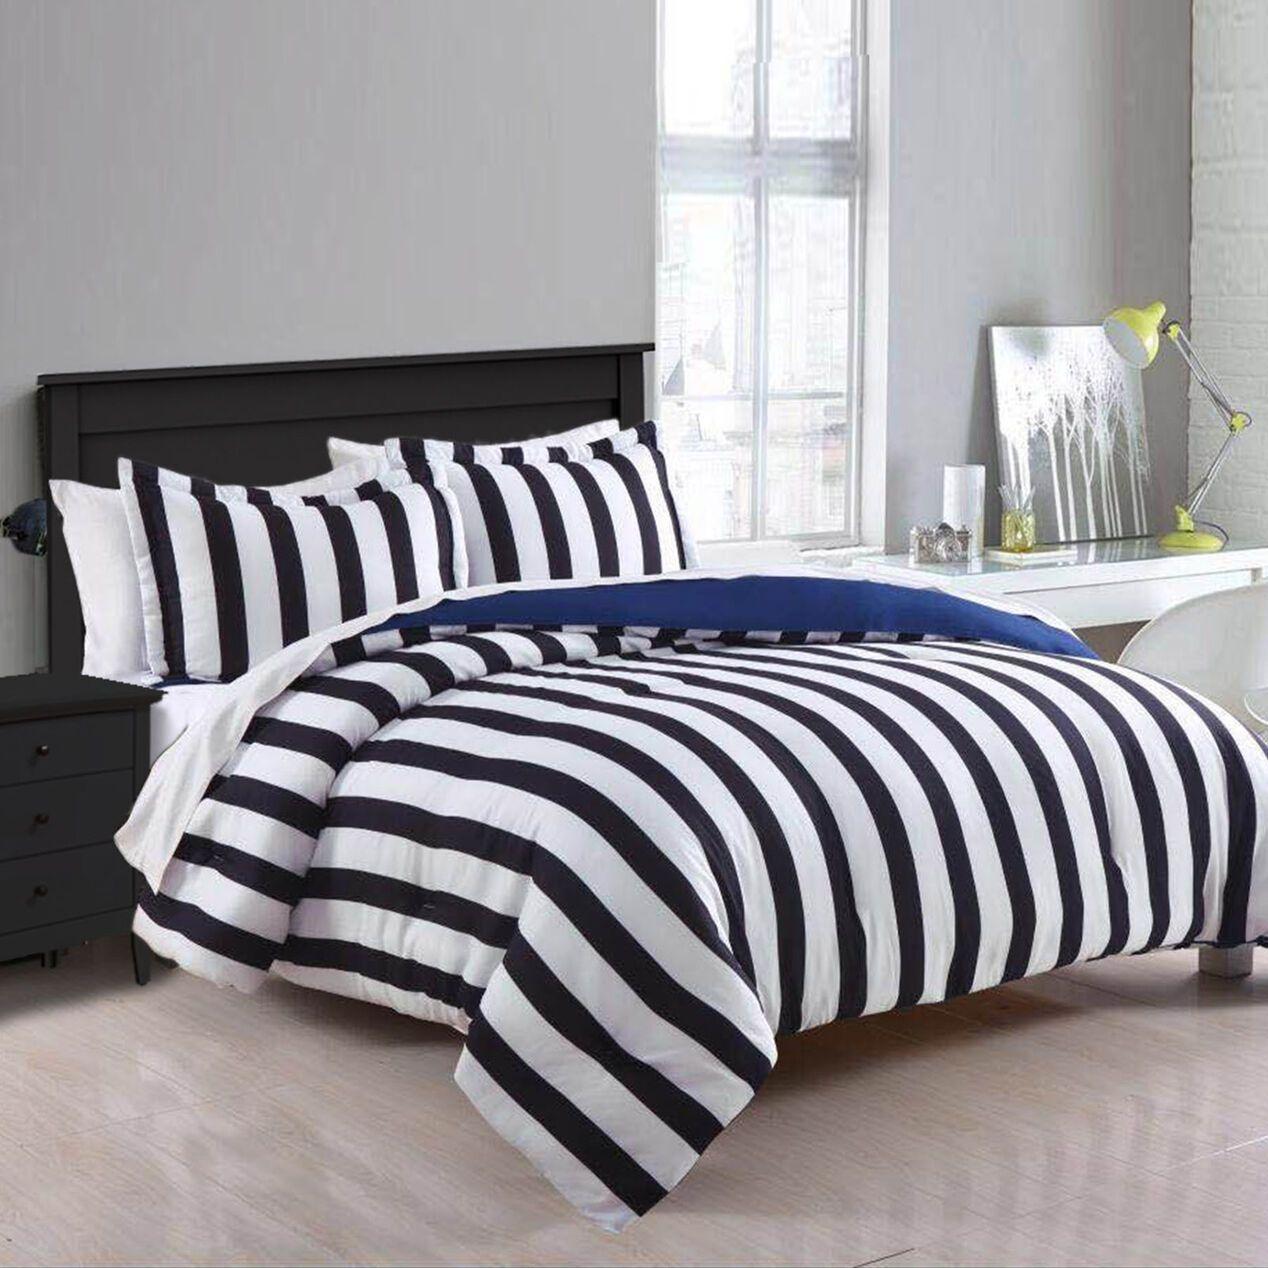 3Piece Black & White Striped Comforter Set, Full/Queen in